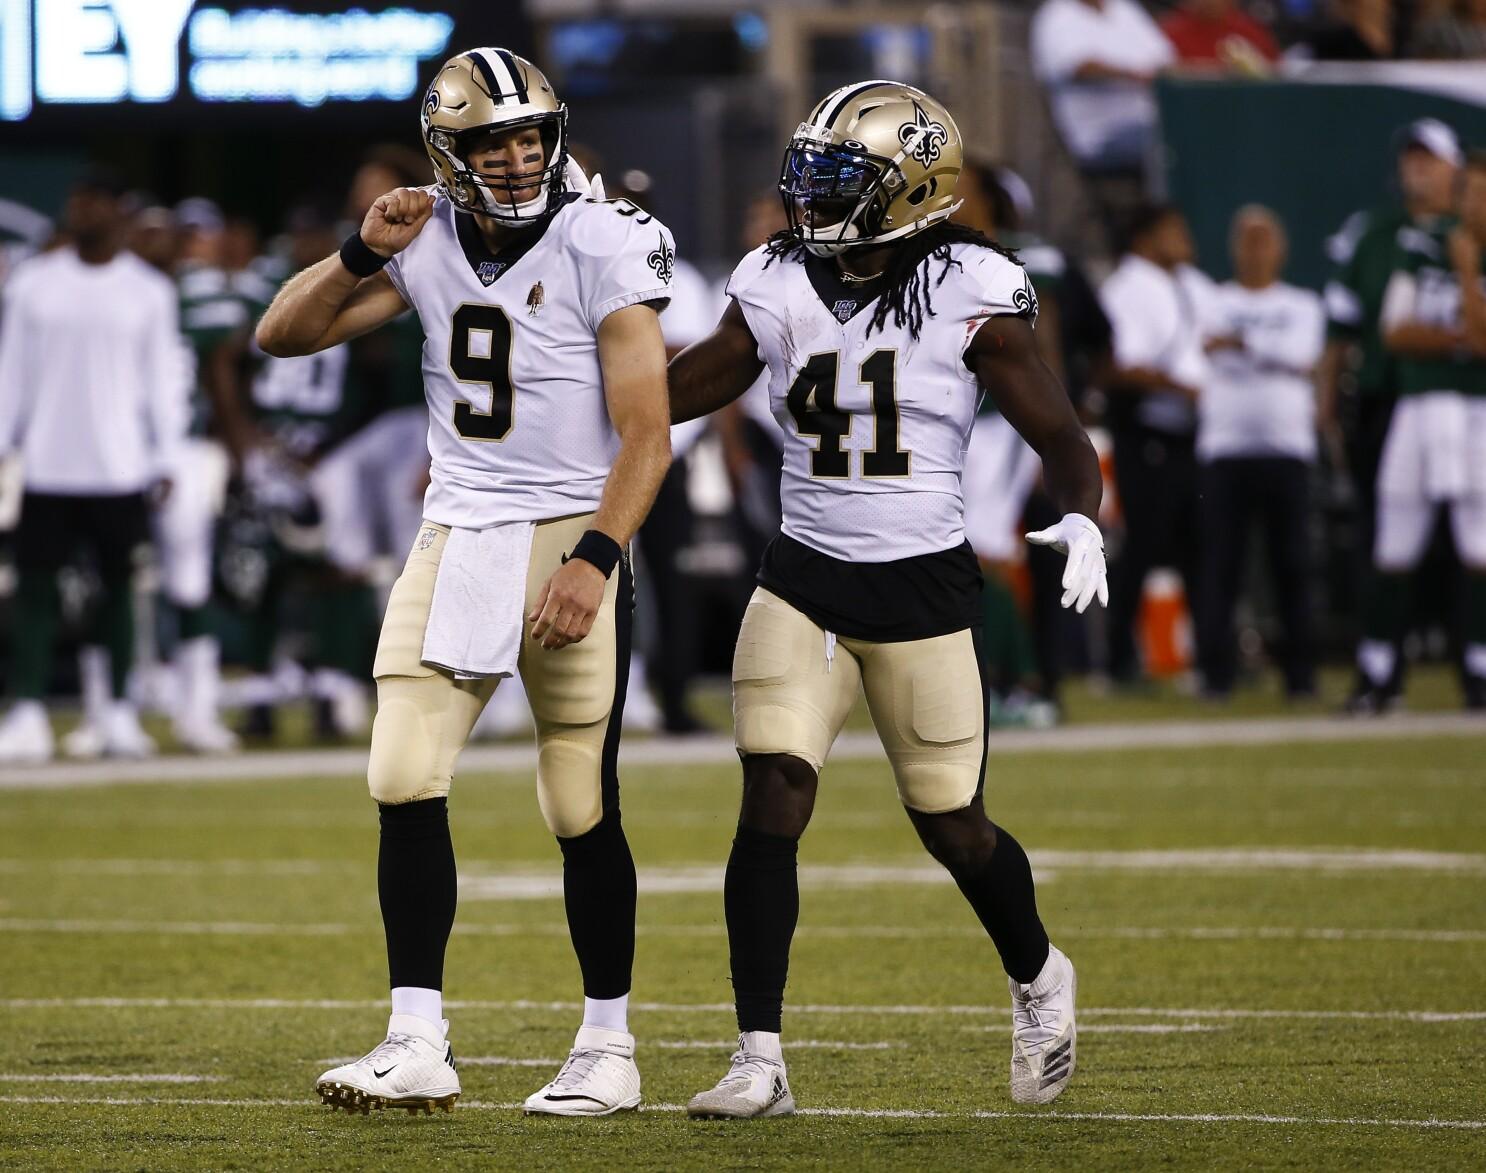 NFL preseason: Drew Brees is sharp in Saints' win over Jets; 49ers defeat Chiefs